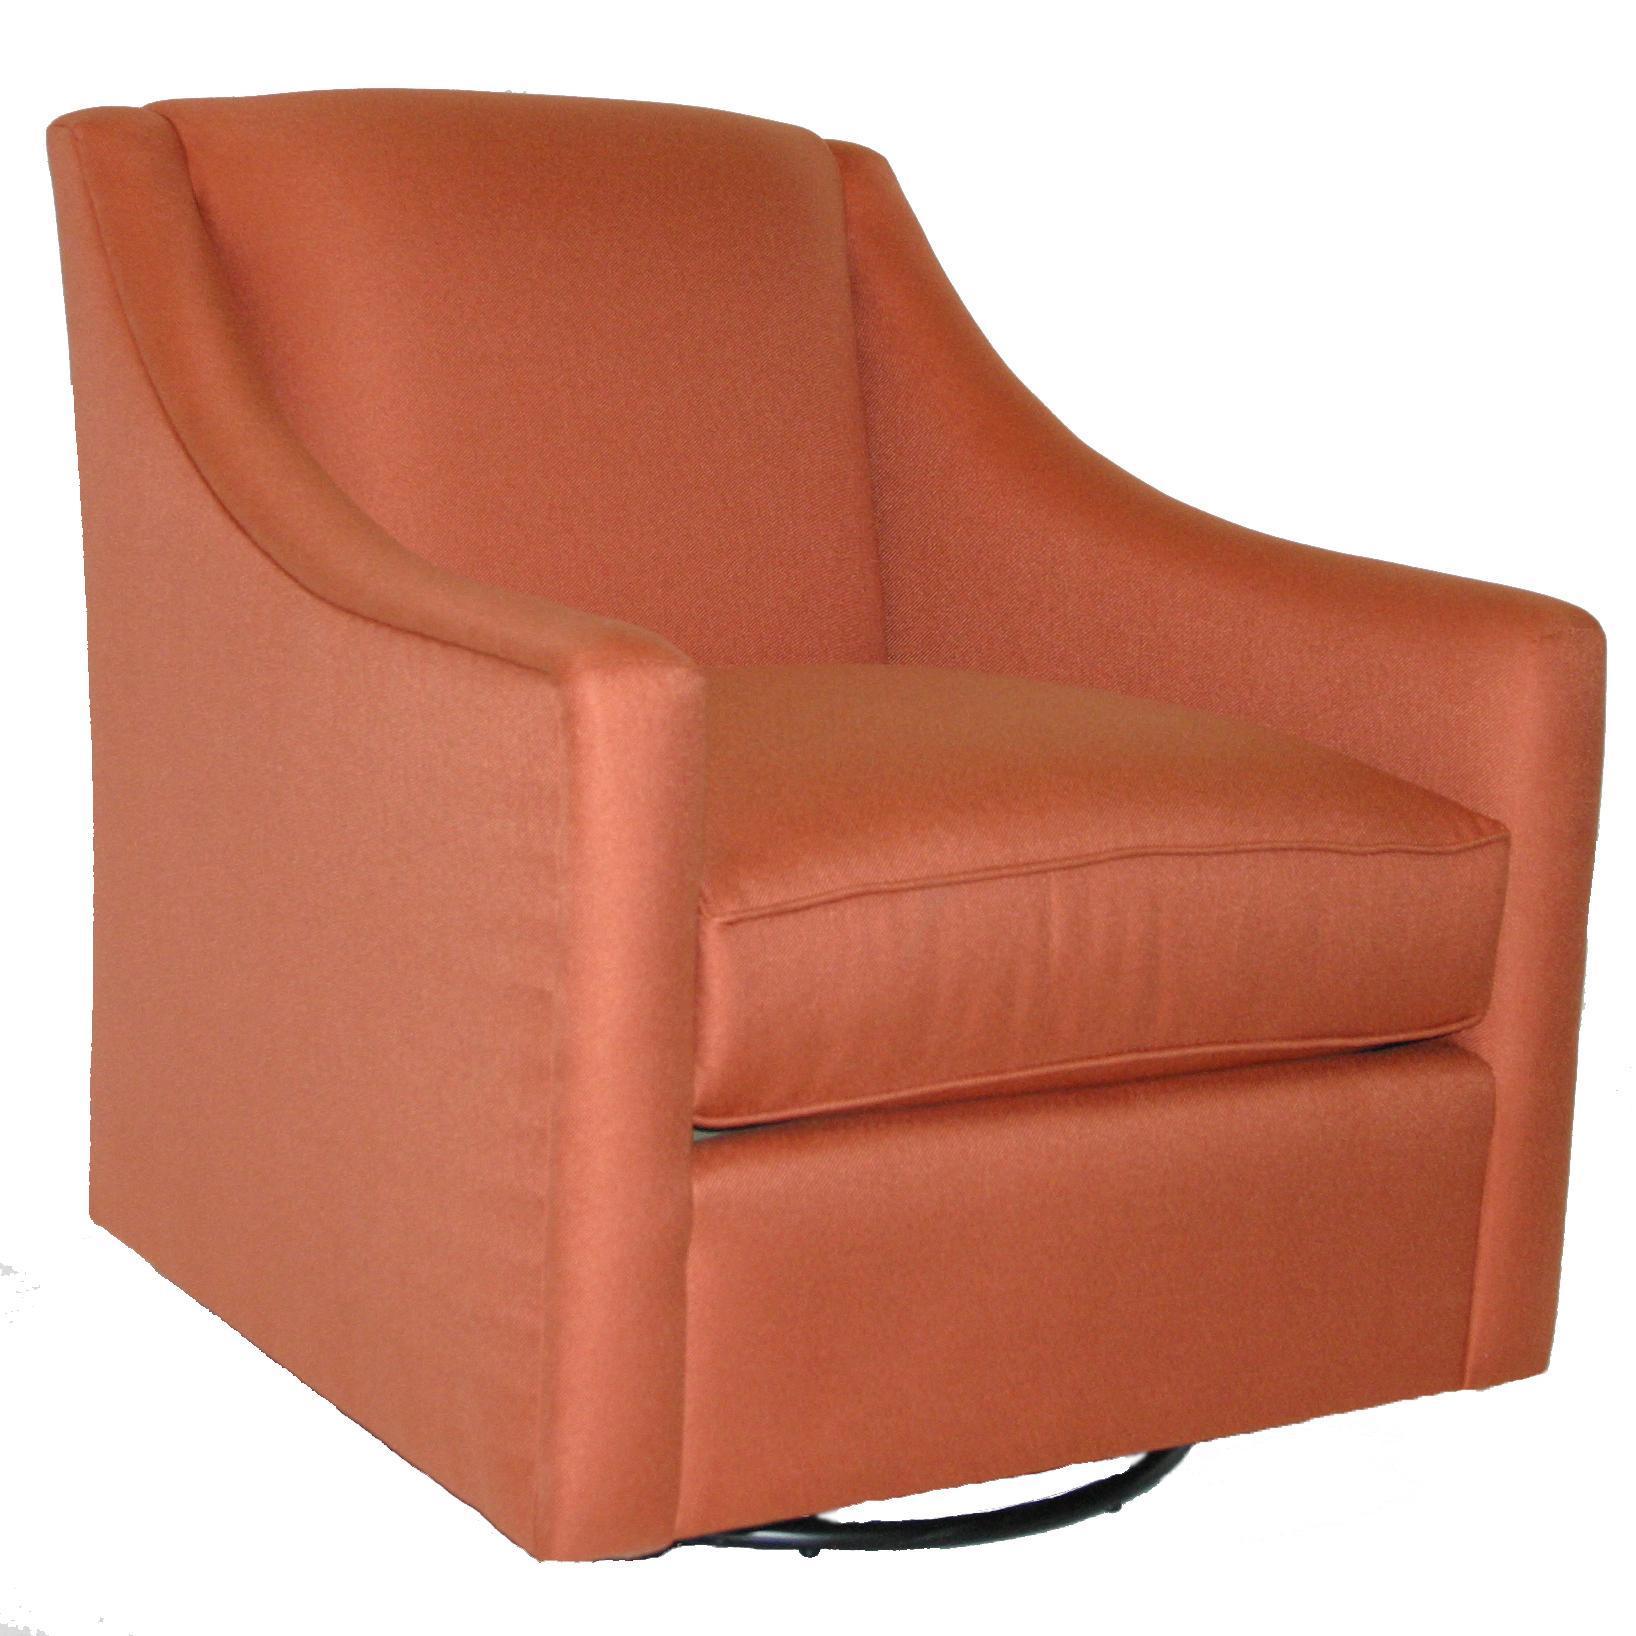 1045 Swivel Chair by Bassett at Dean Bosler's